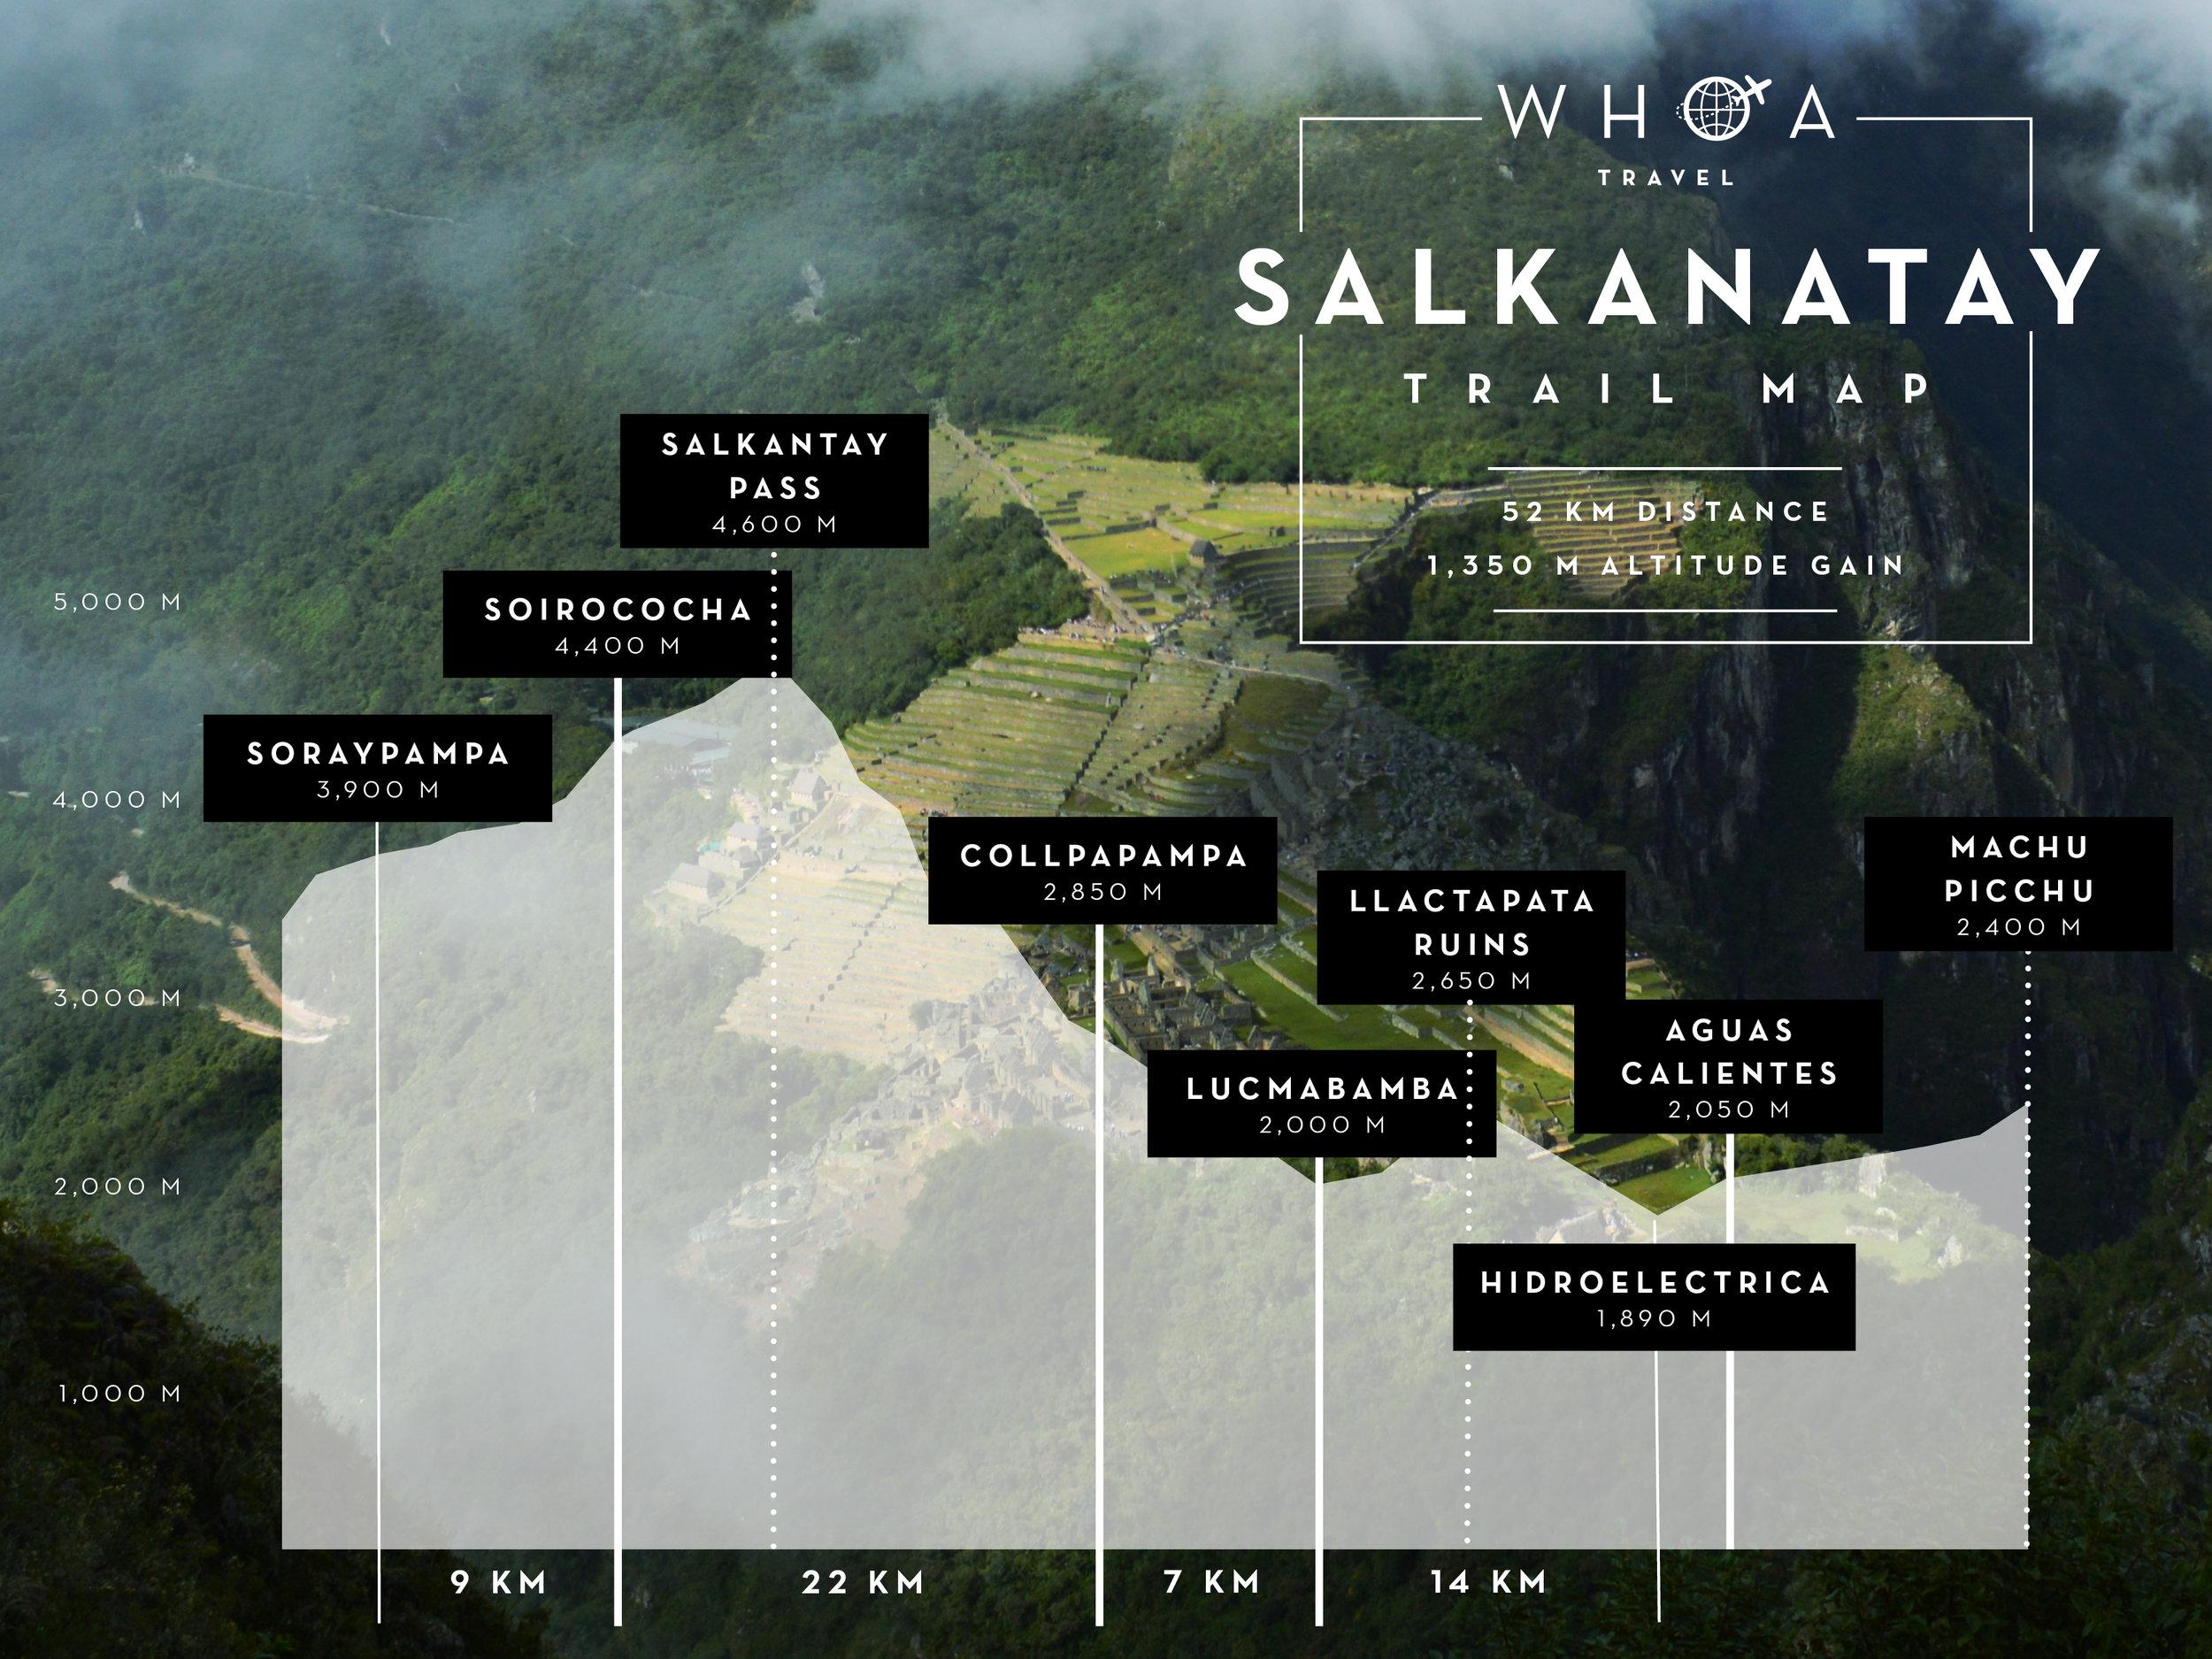 Salkantay Trail Map WHOA travel.jpg